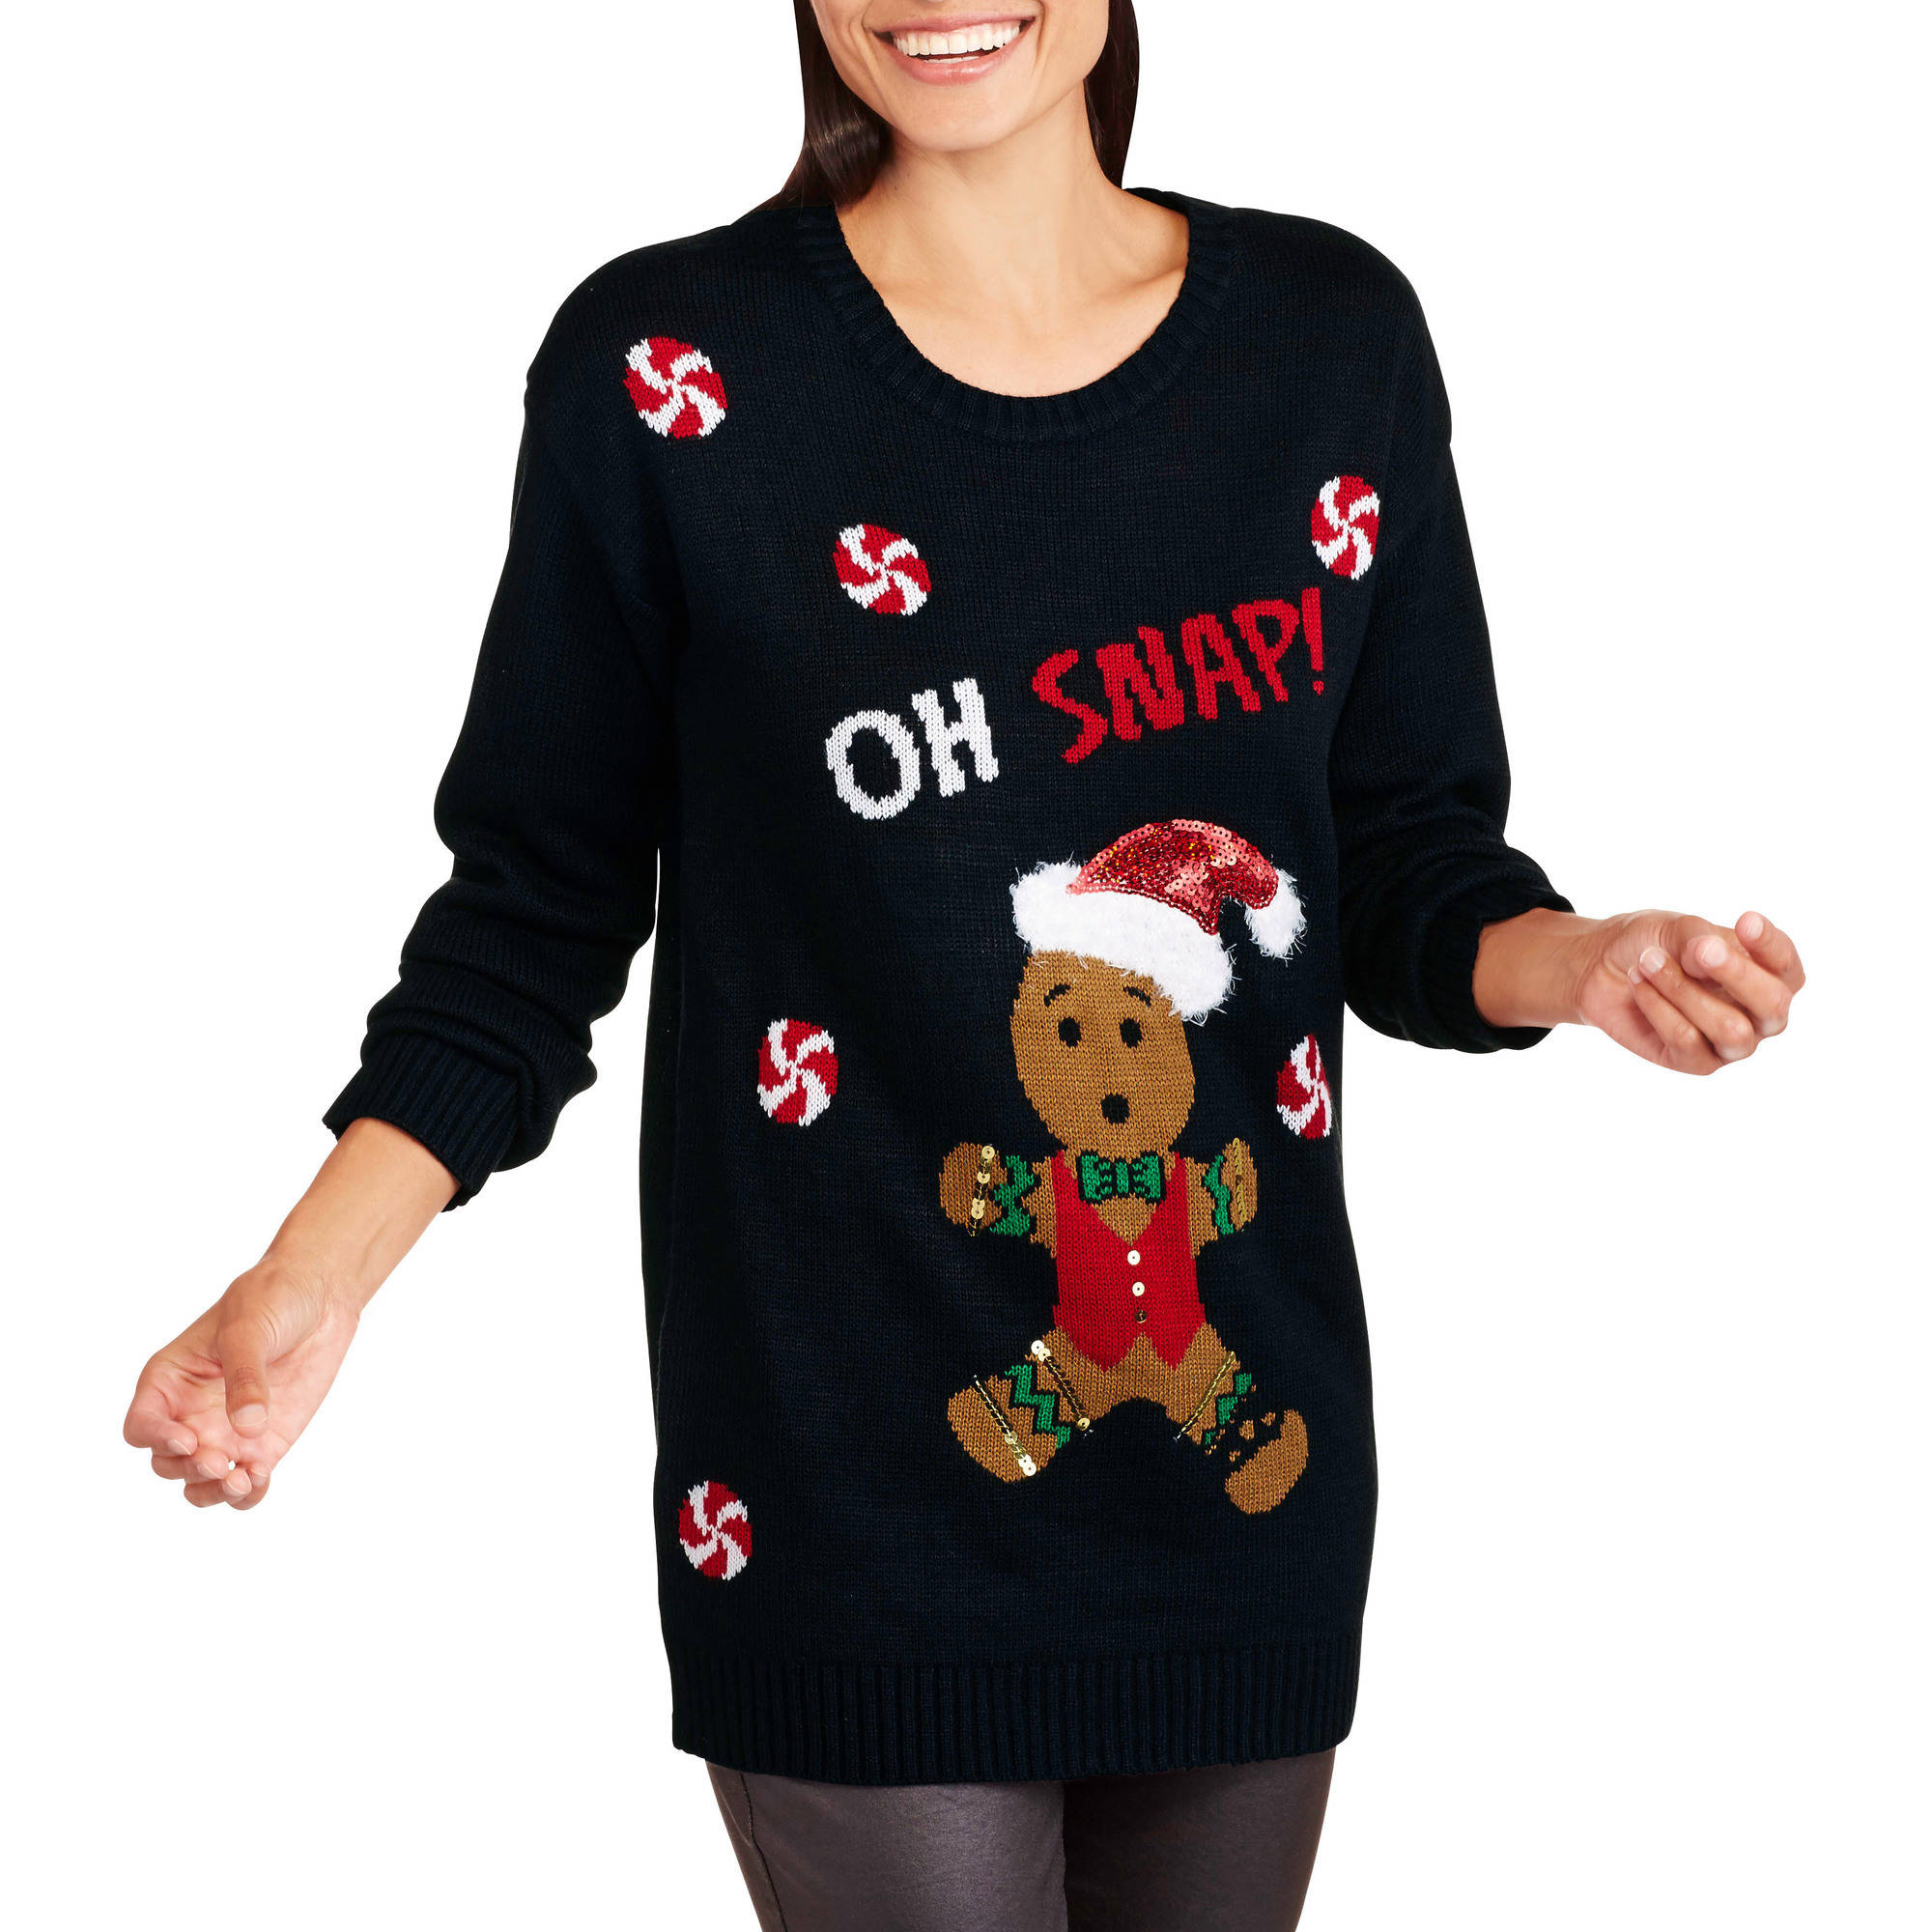 christmas allison brittney womens gingerbread man oh snap christmas sweater walmartcom - Christmas Sweaters Walmart